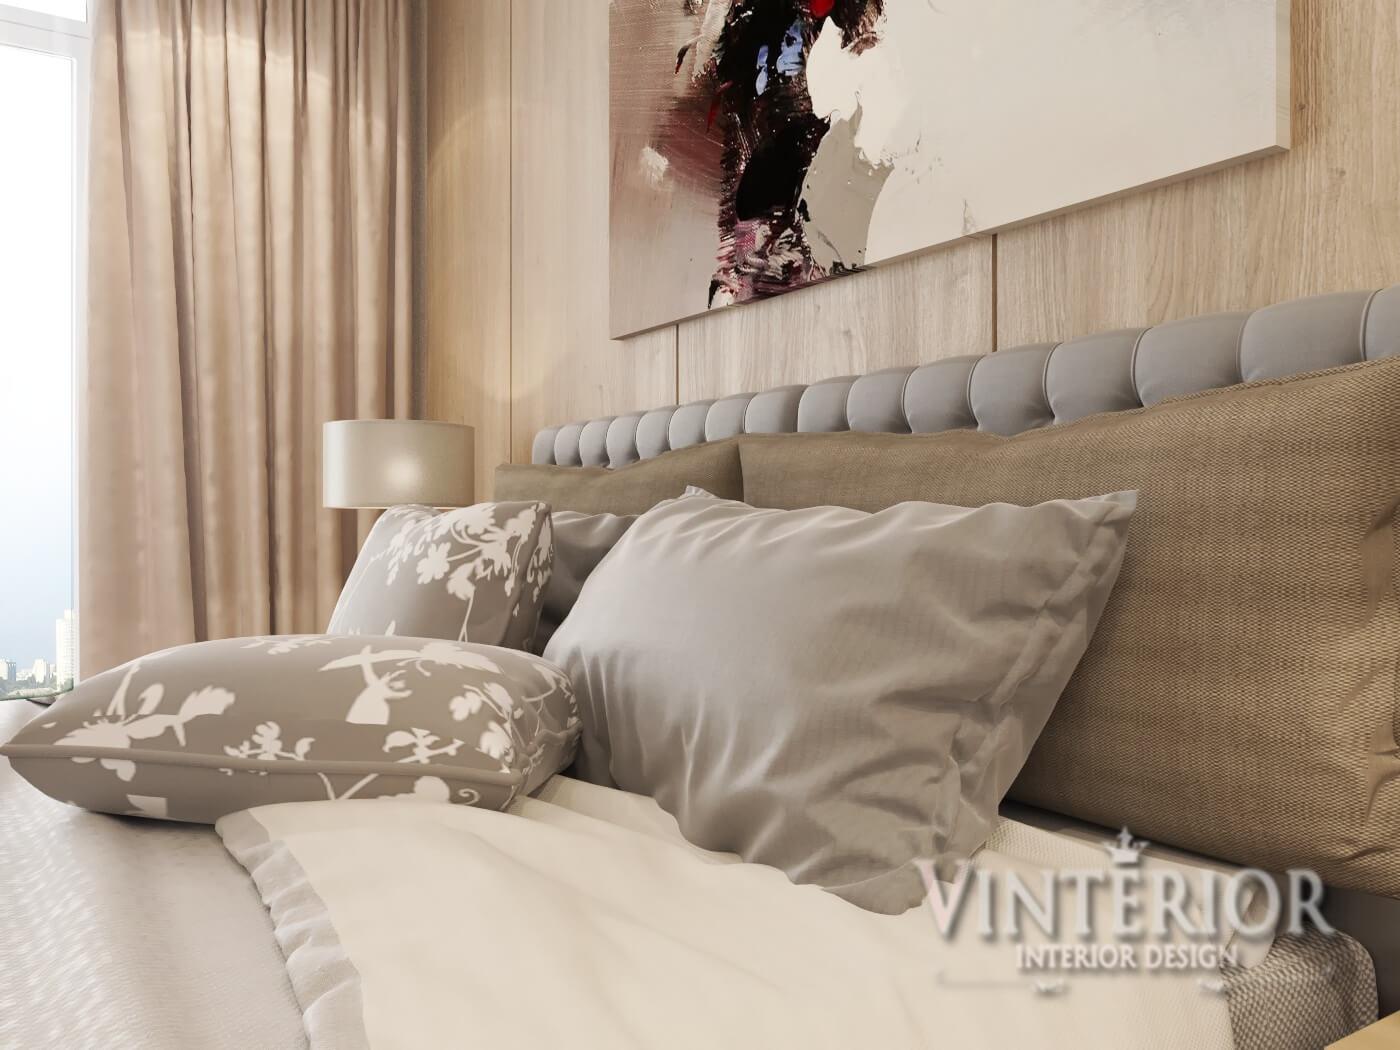 Квартира 3-х комнатная, ЖК «Парковые озера», г. Киев